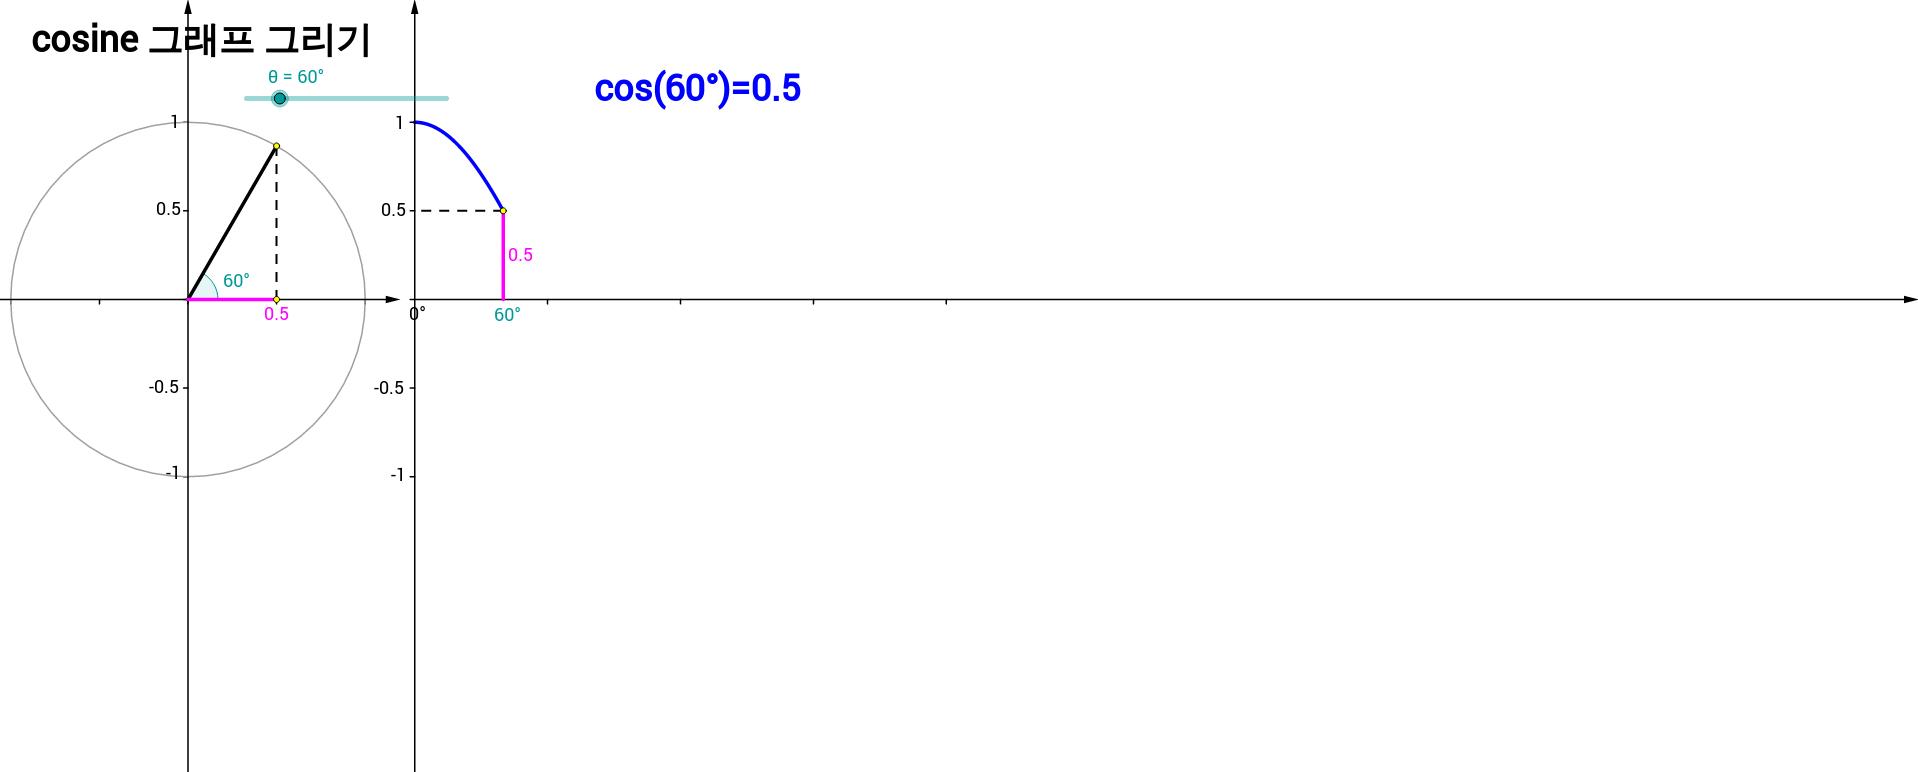 cosine 그래프 그리기